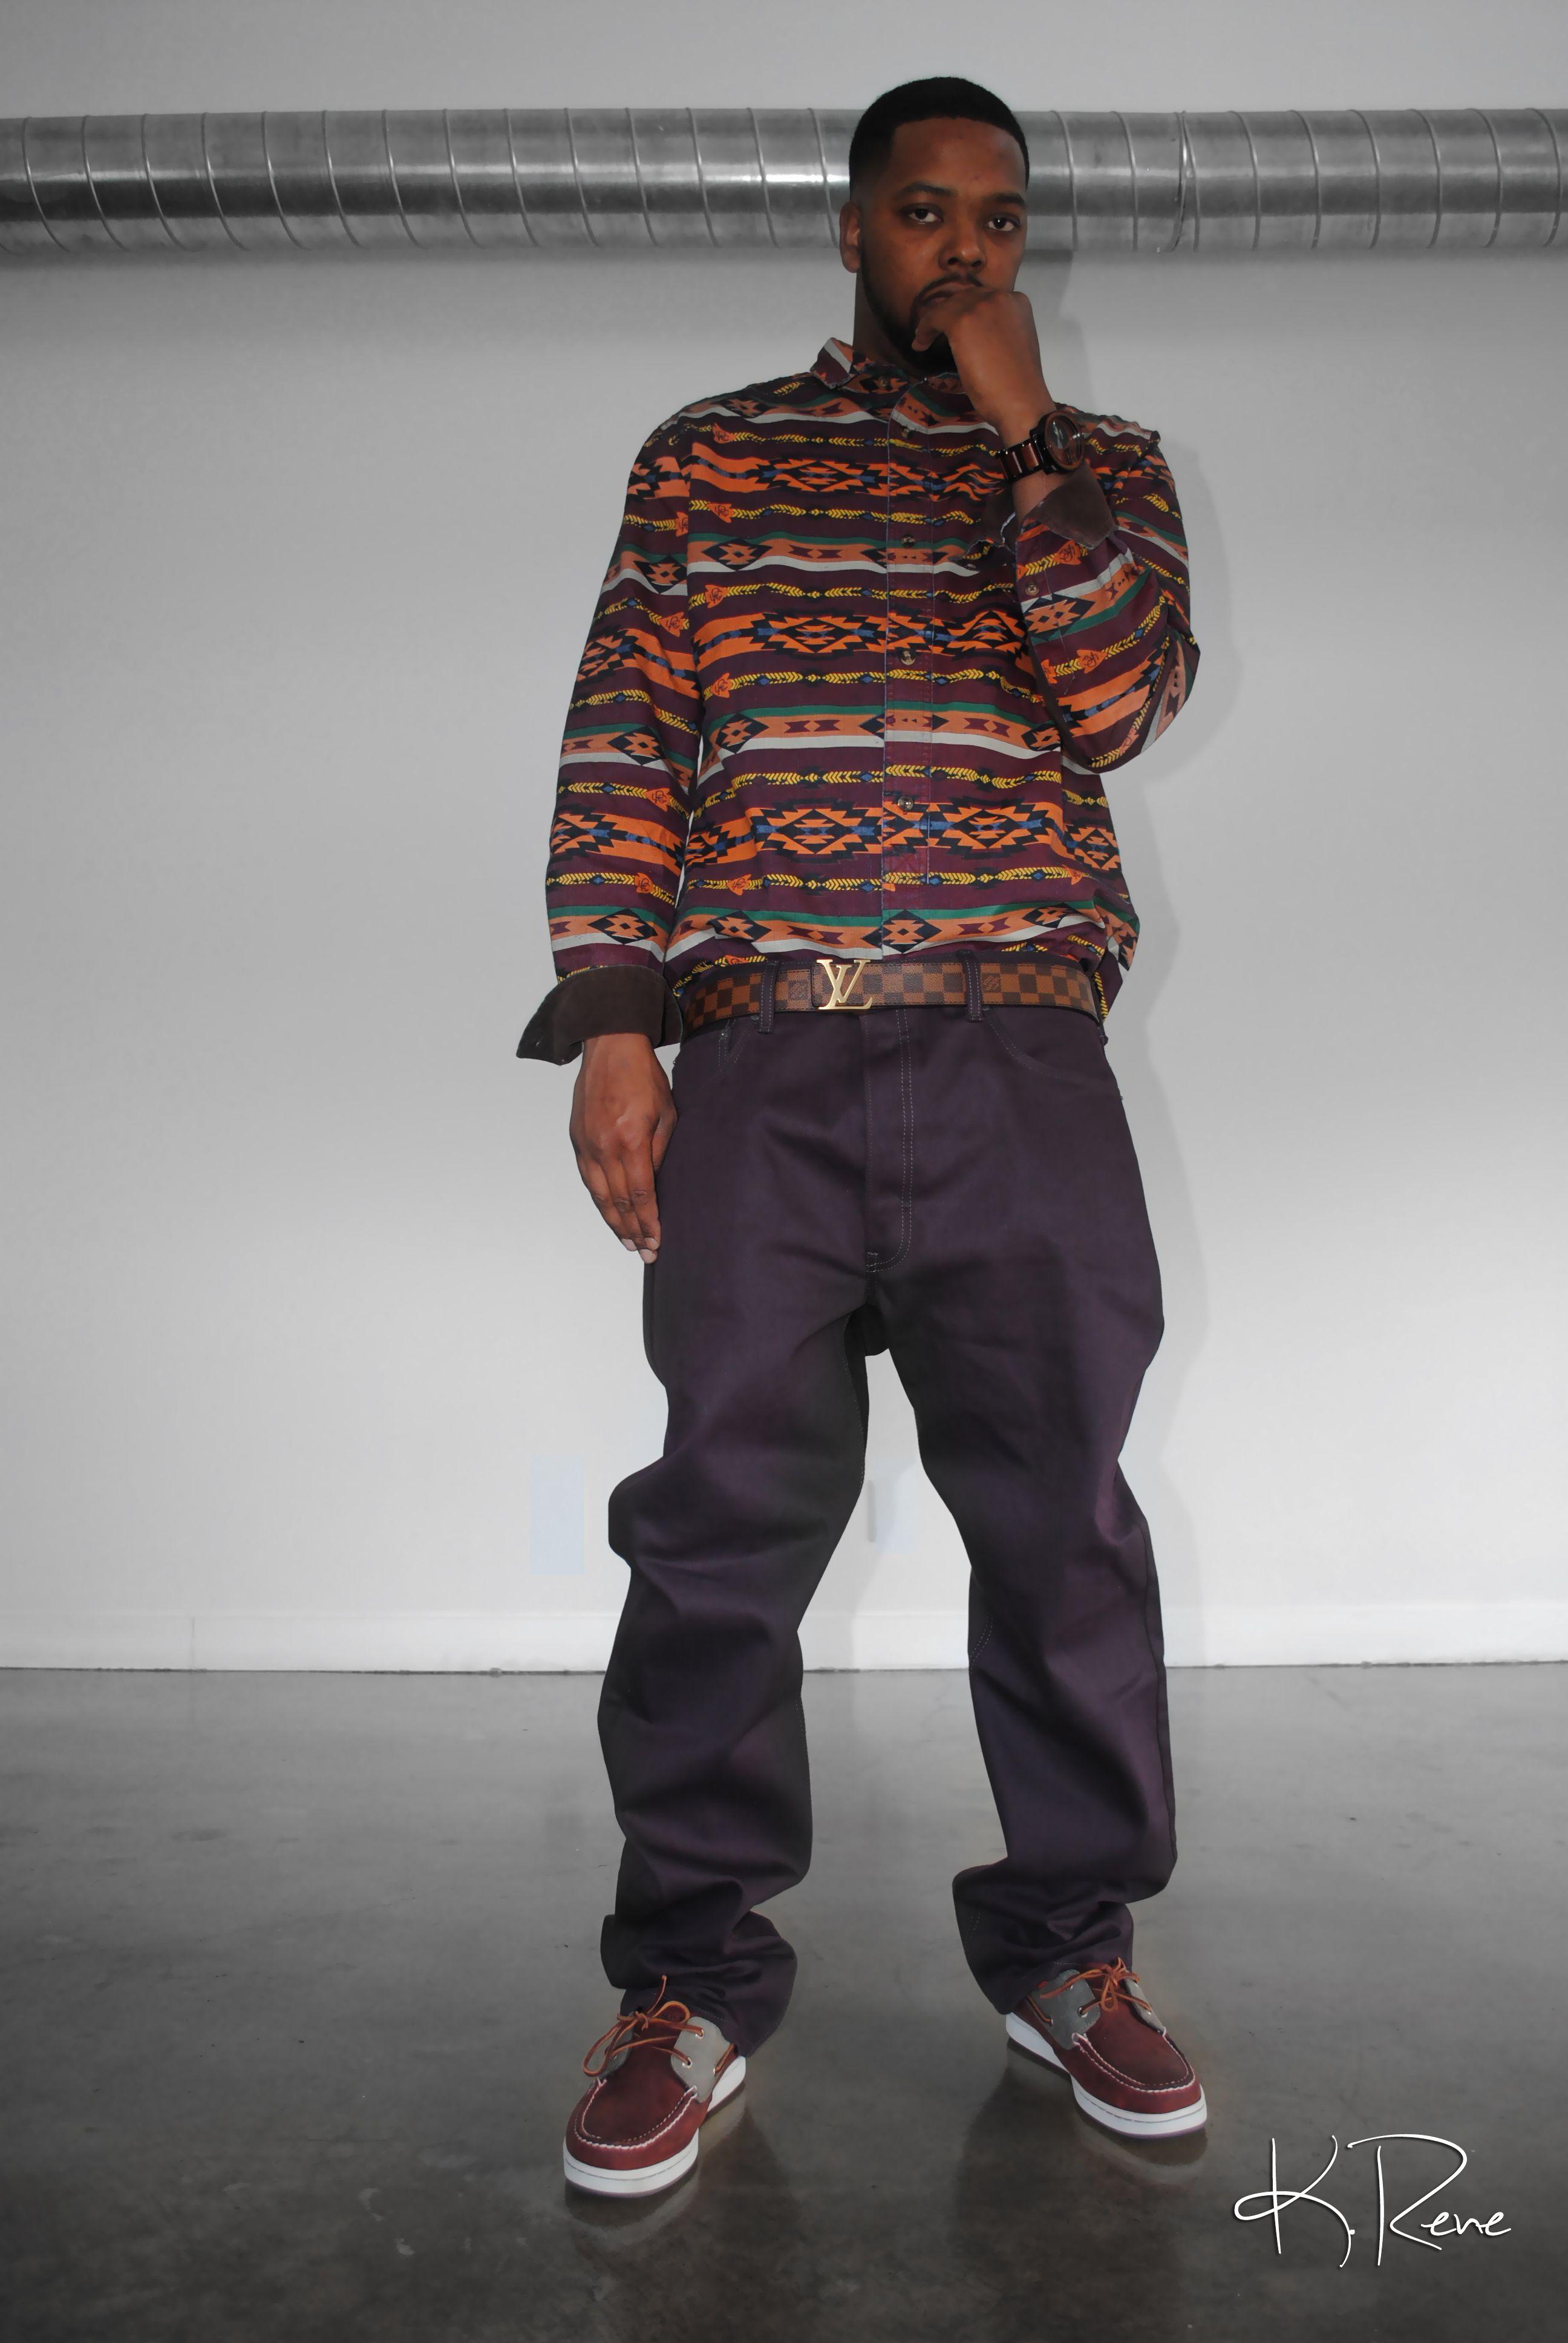 Men's Urban Wear ... Men's Fashion